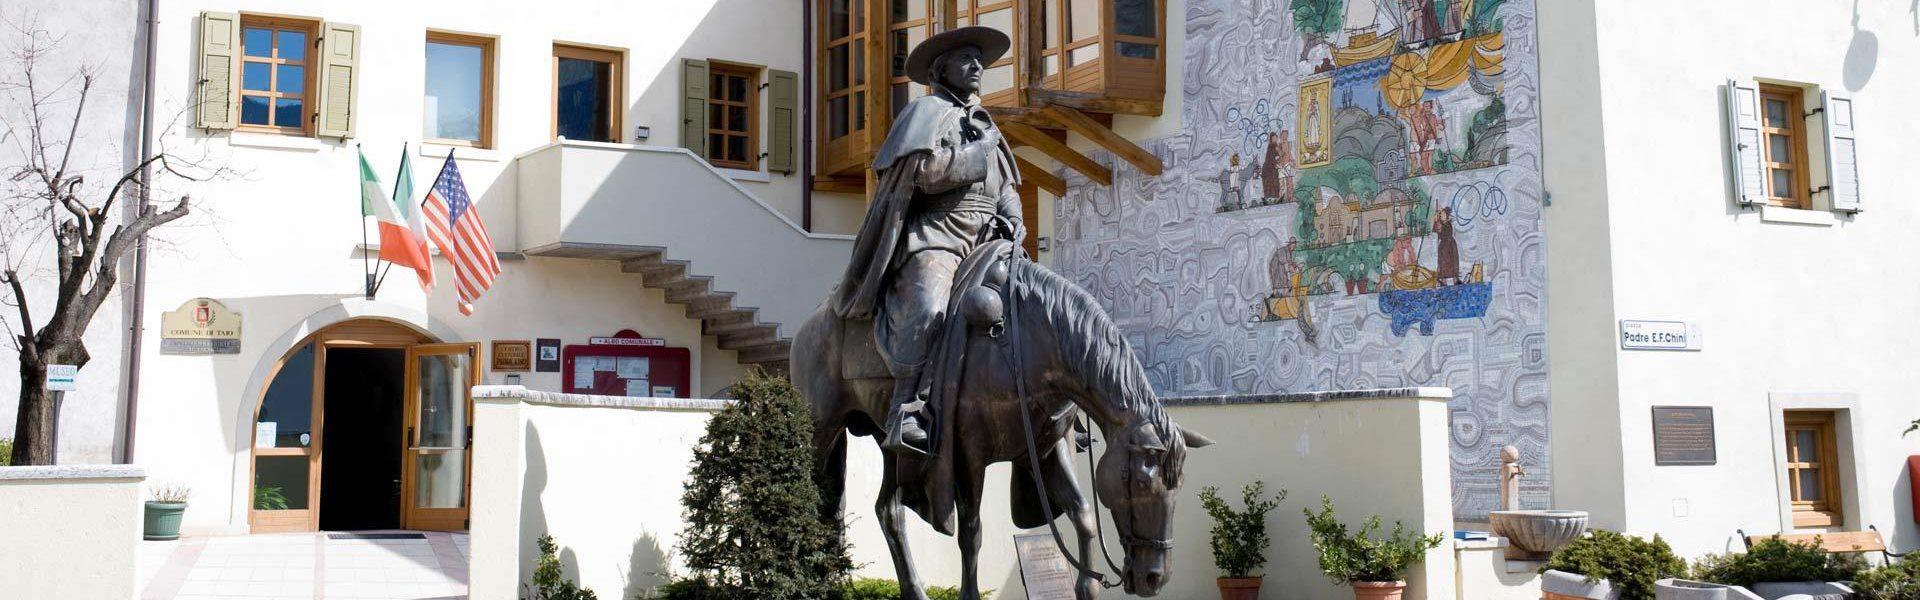 El Padre Kino, el misionero a caballo, reconocido por la Iglesia universal